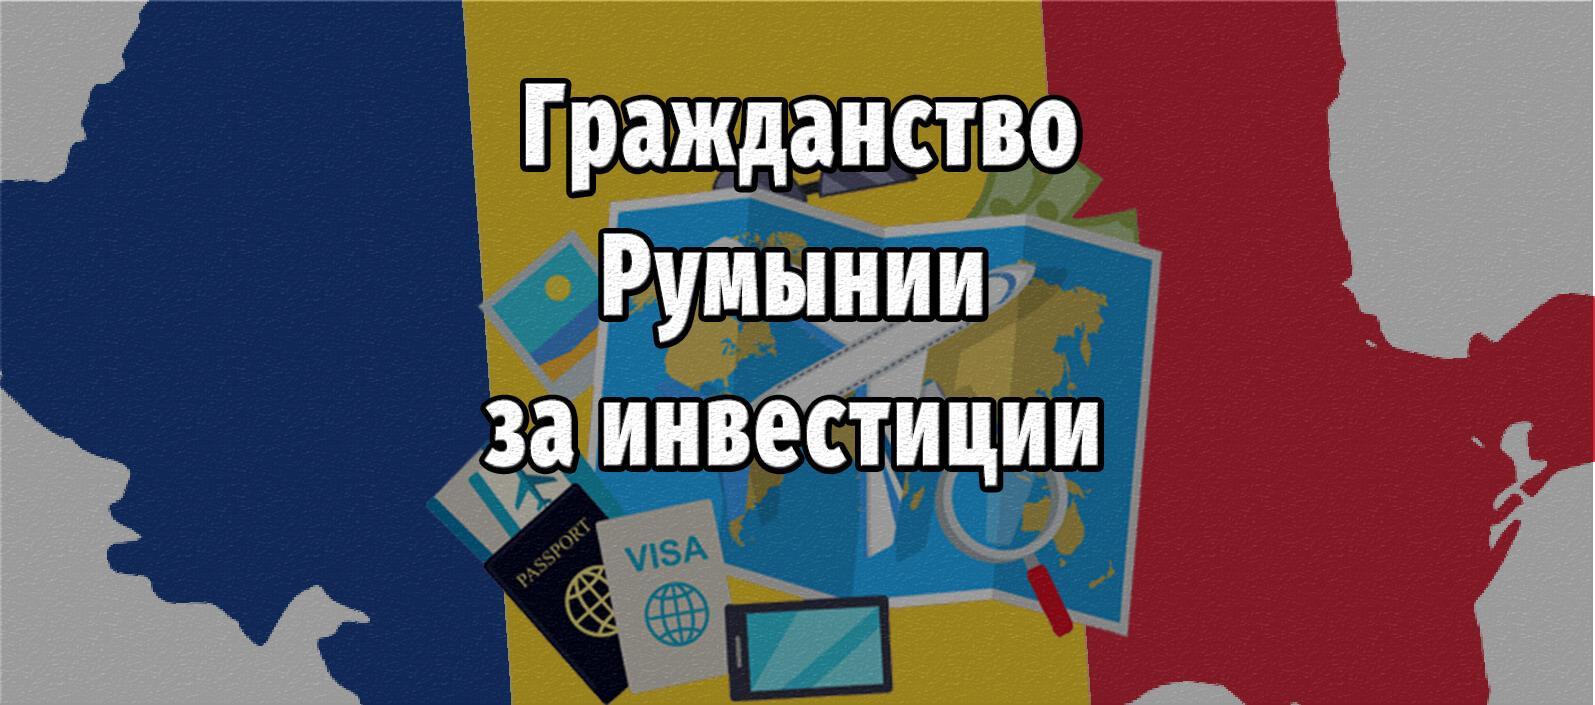 гражданство румынии за инвестиции